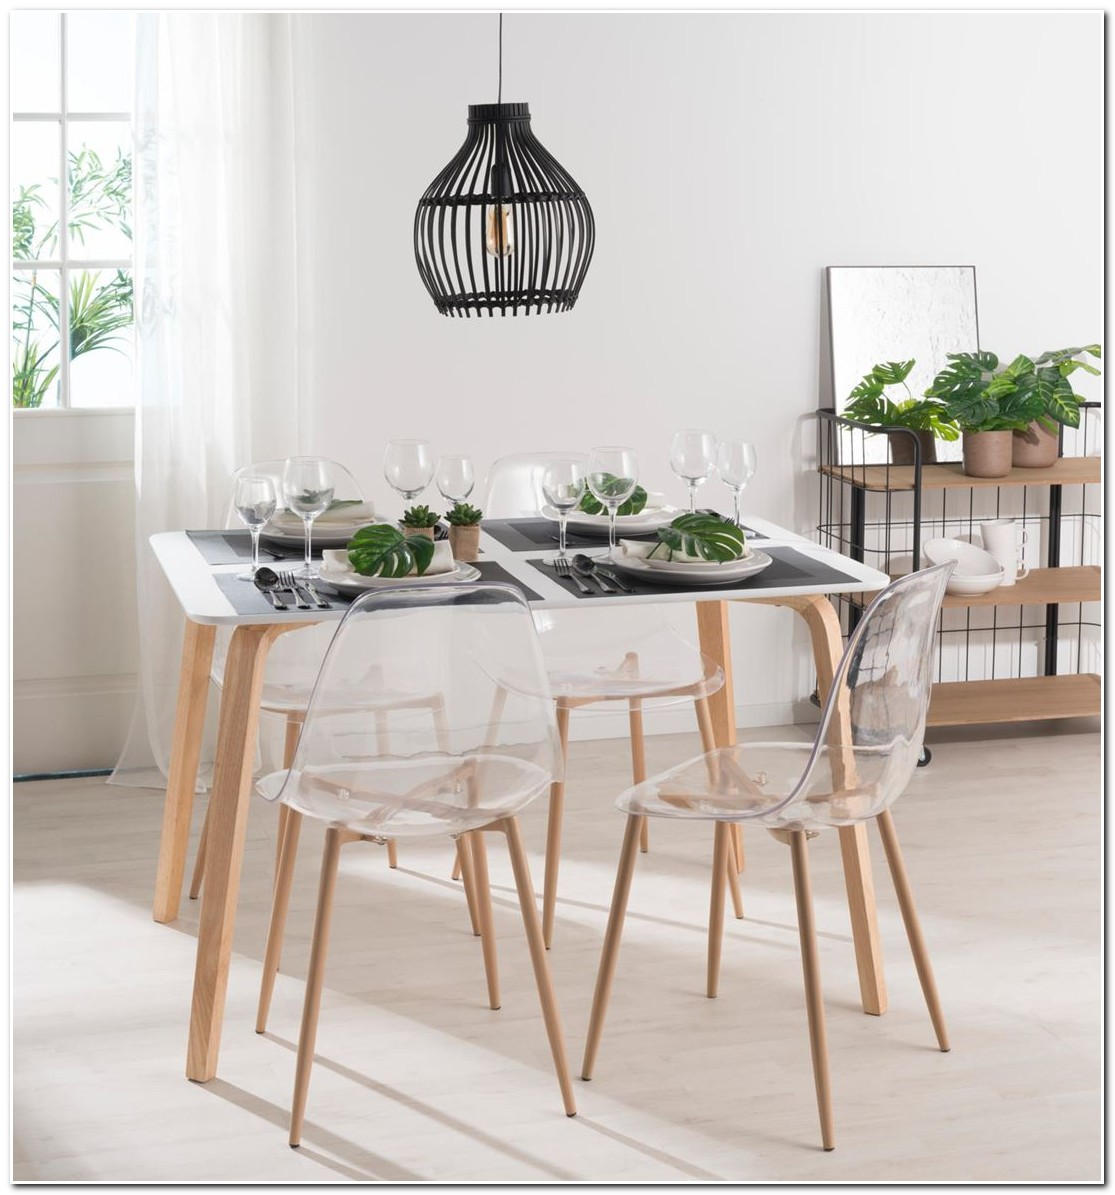 Chaise Salle à Manger Design Transparente